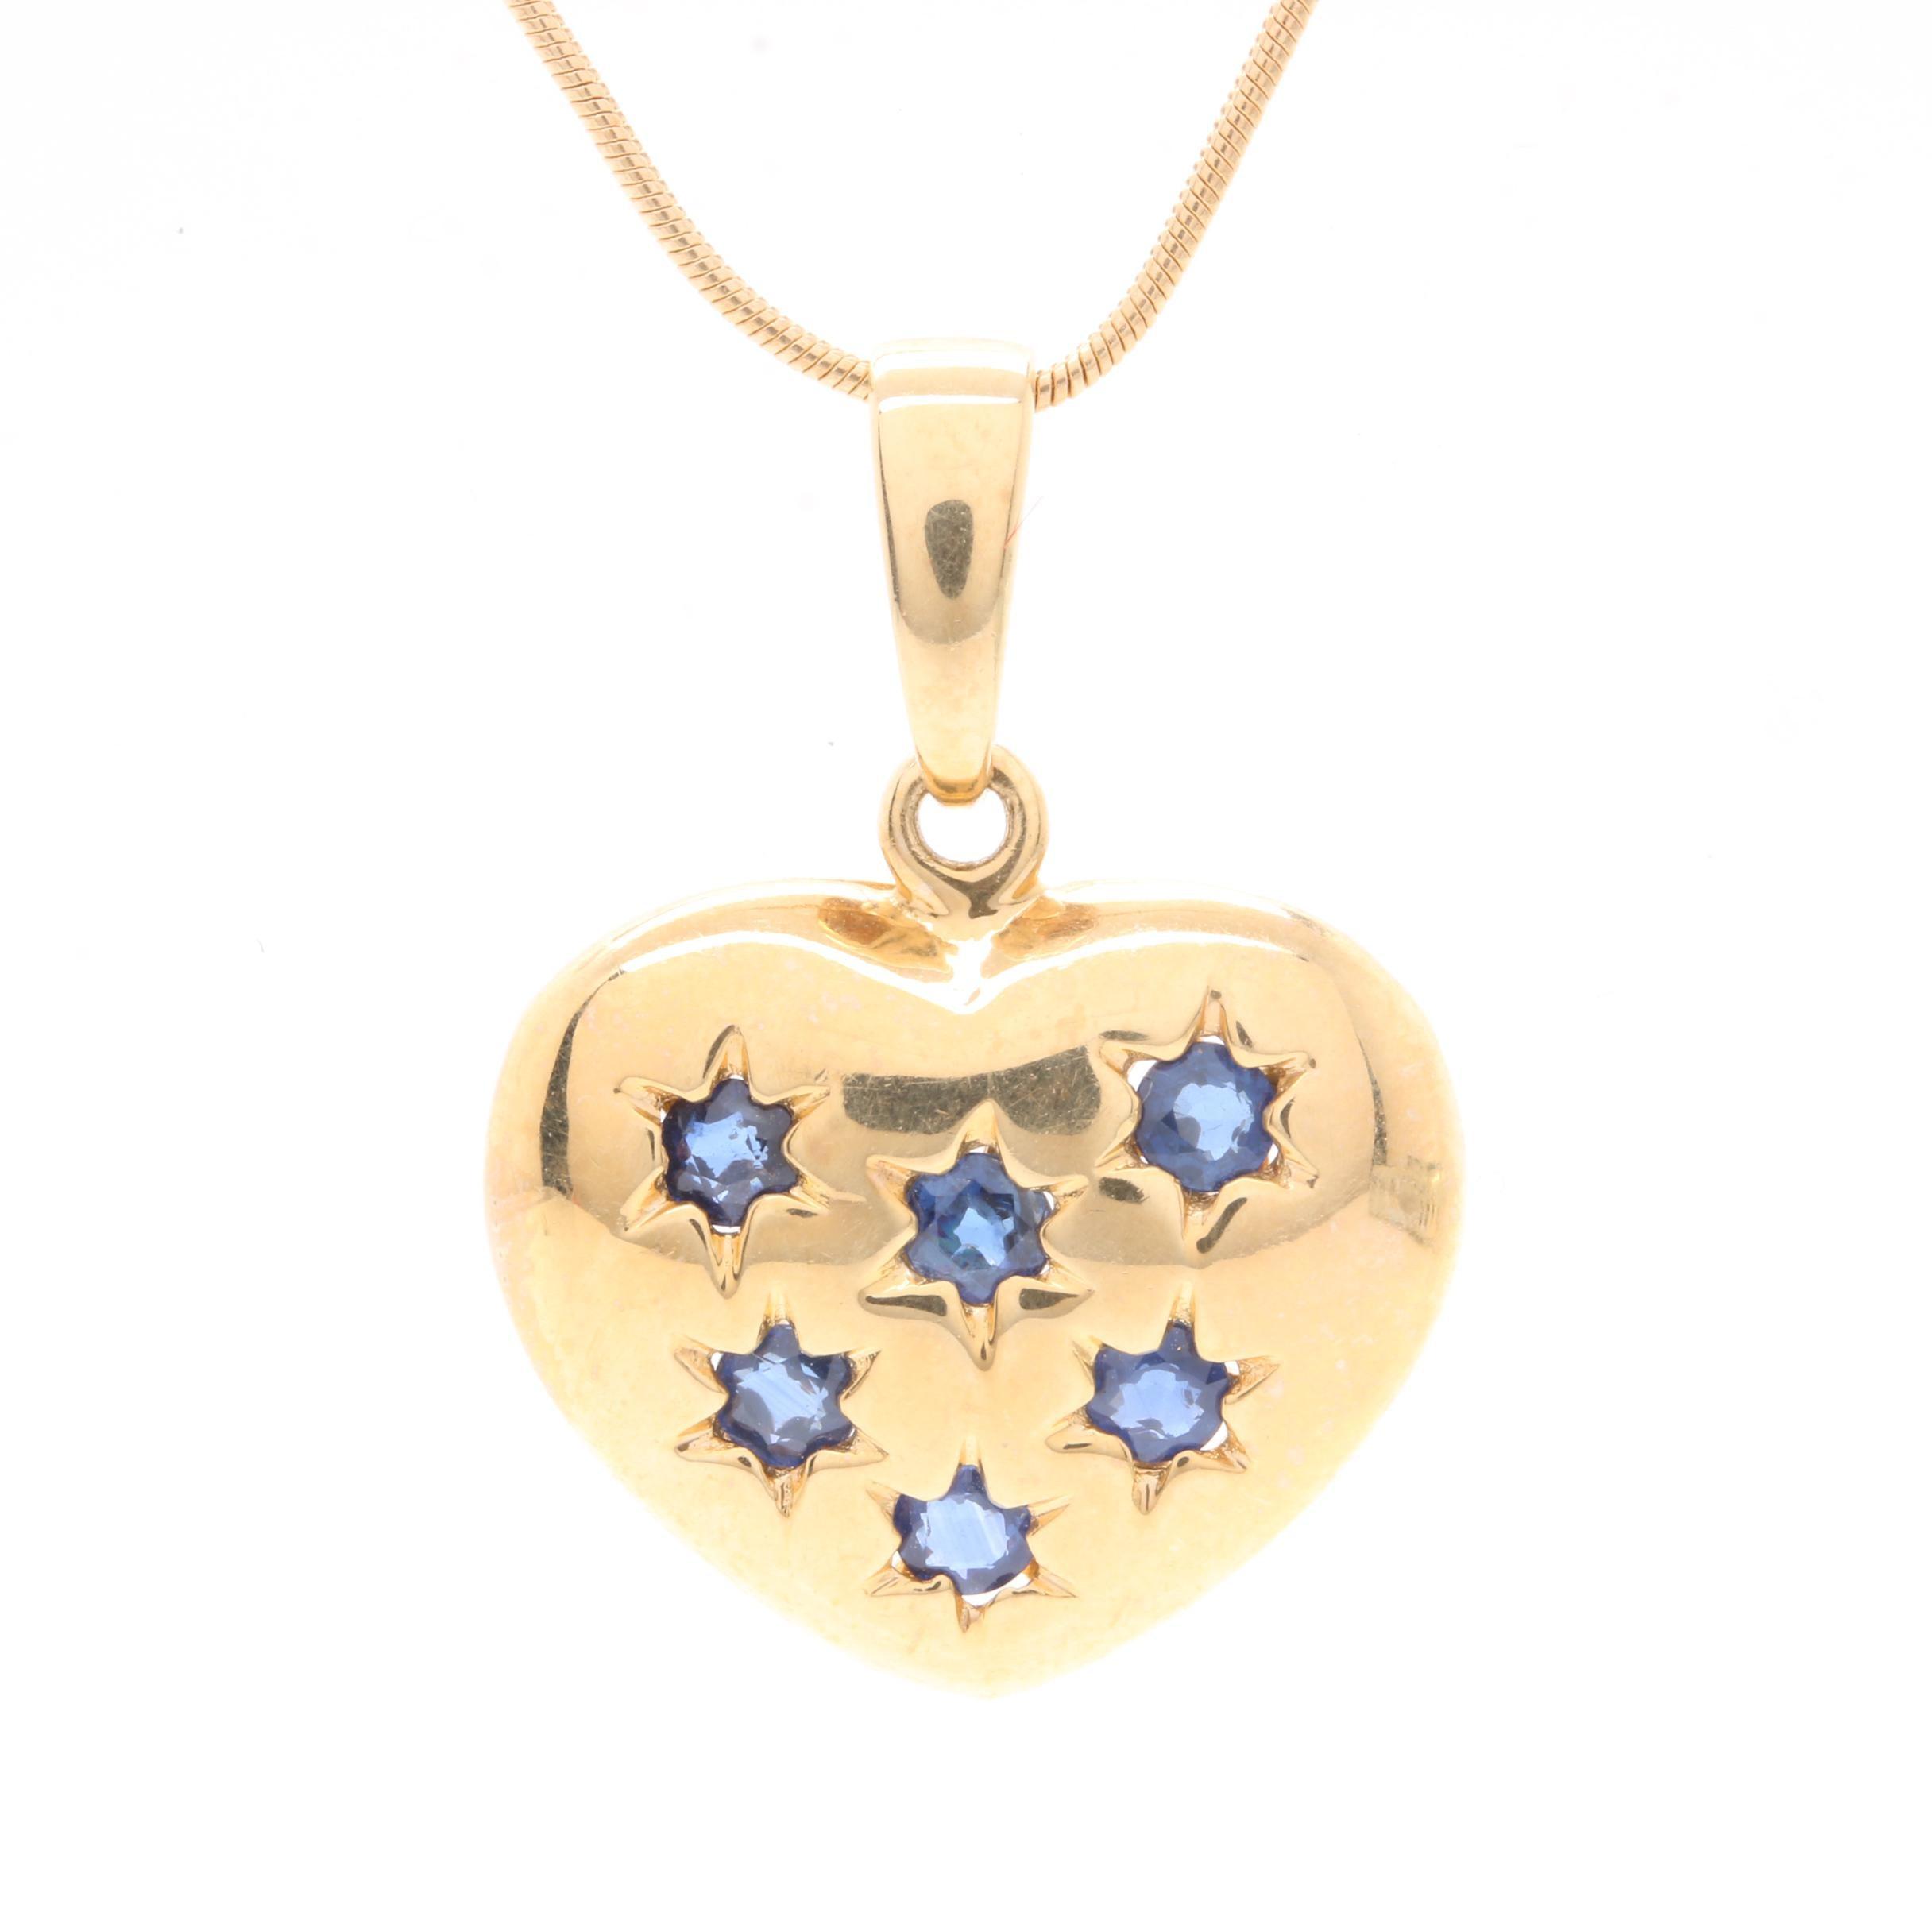 14K Yellow Gold Sapphire Heart Pendant Necklace